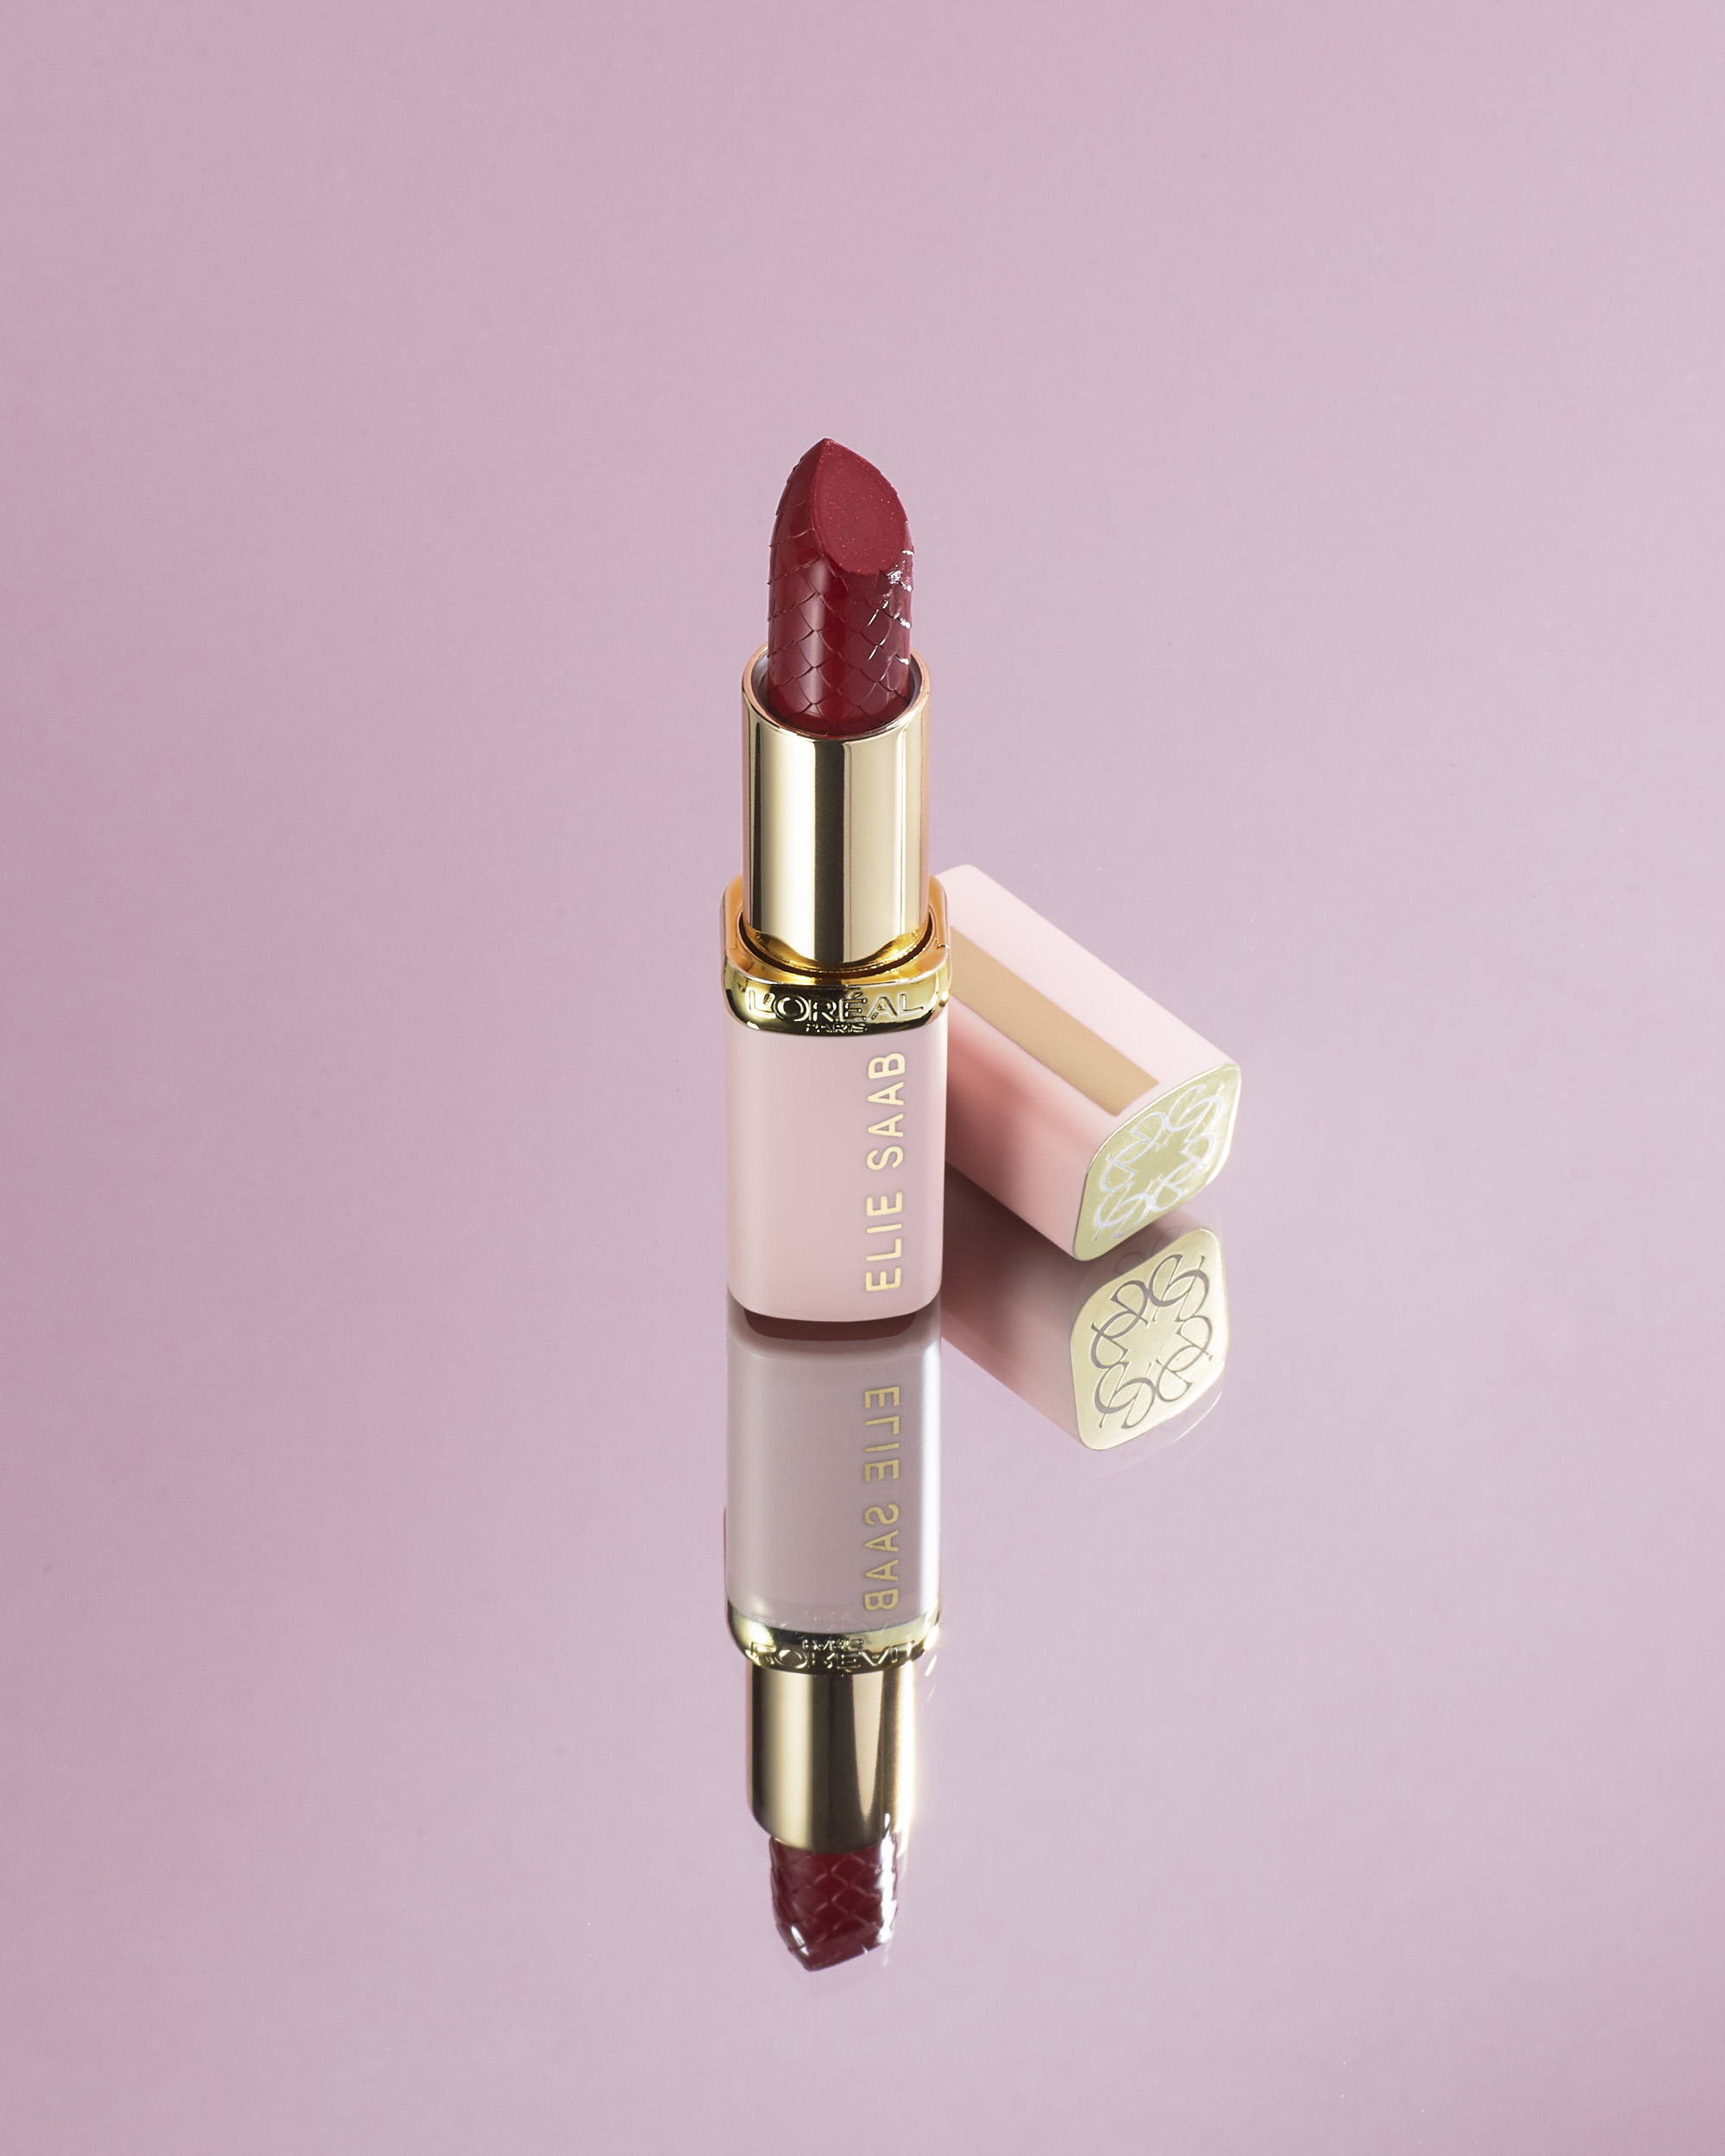 L'Oreal-Paris-x-Elie-Saab-Lipstick